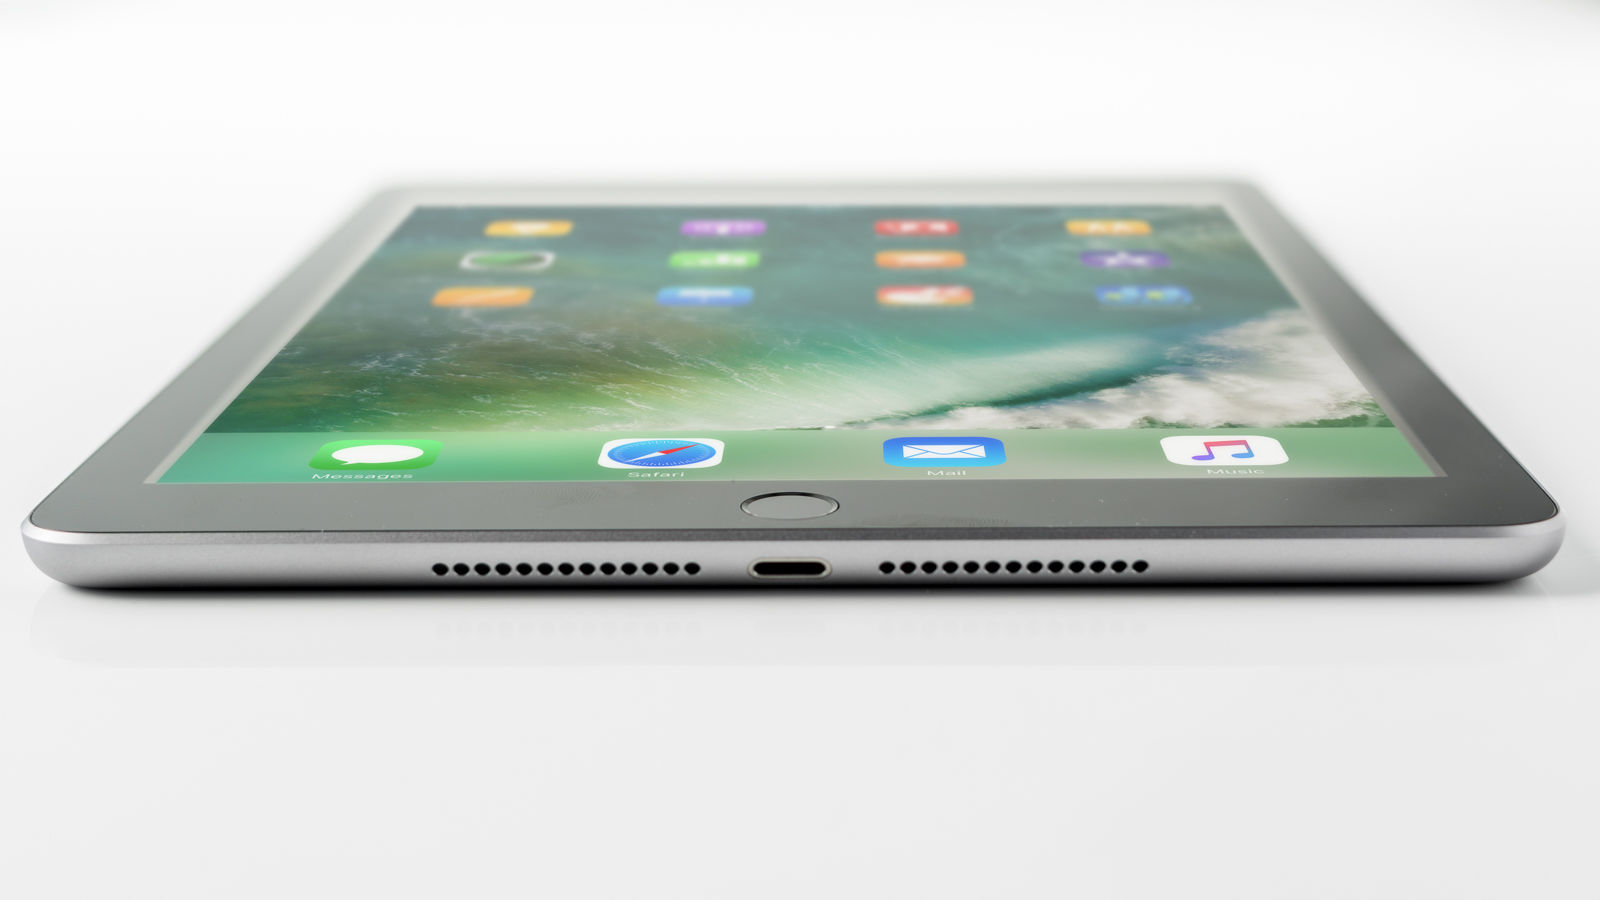 Cómo usar un iPad: puerto Lightning